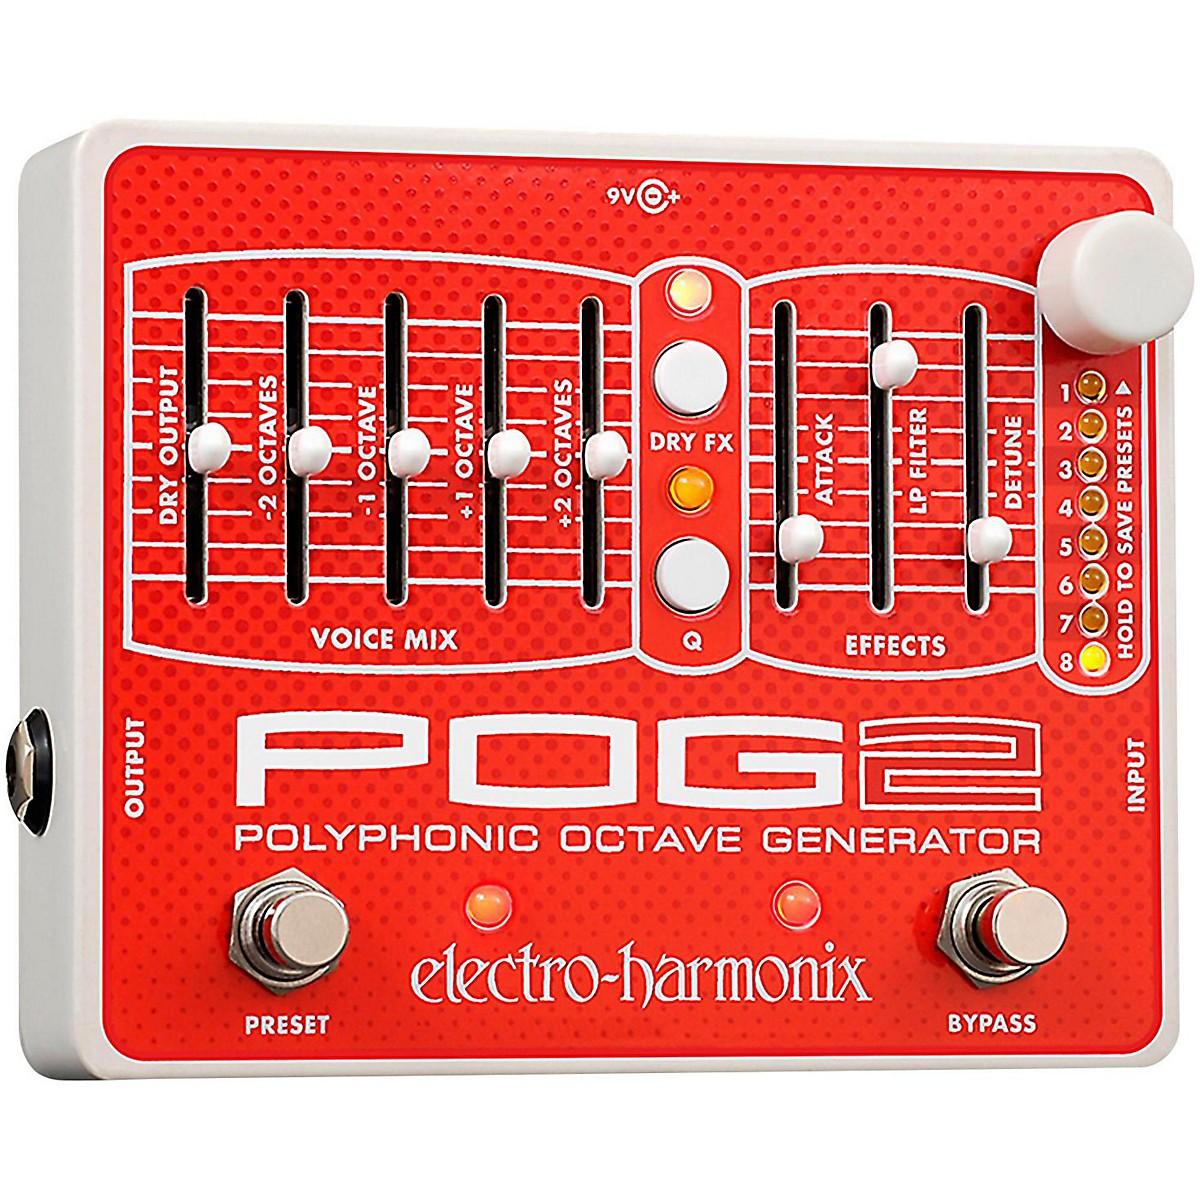 Electro-Harmonix POG2 Polyphonic Octave Generator Guitar Effects Pedal